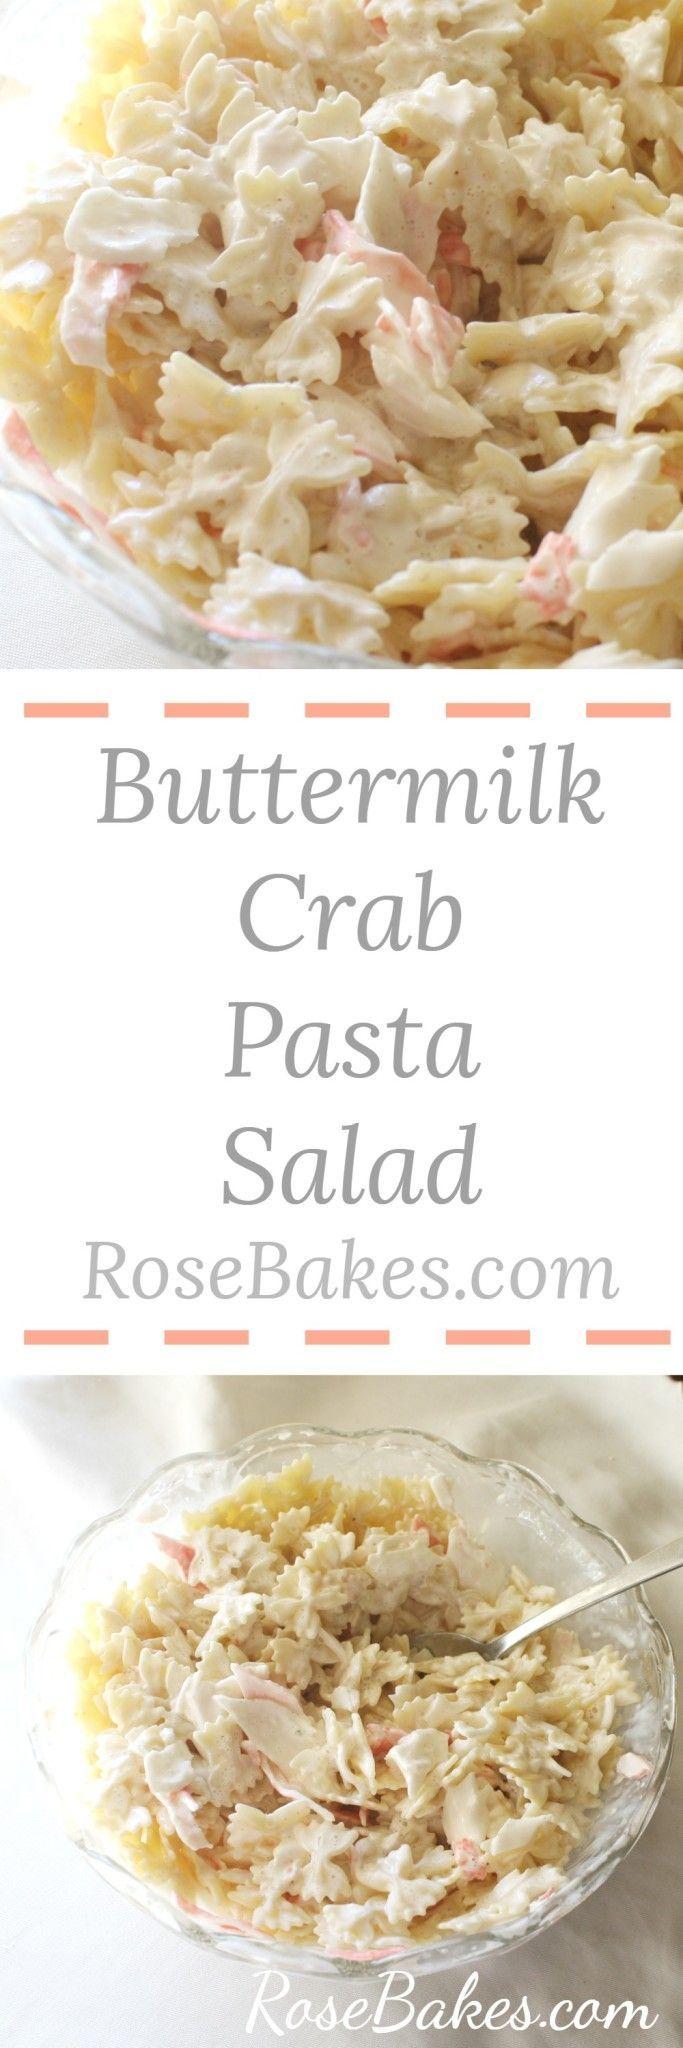 Seafood & Crab Buttermilk Pasta Salad Recipejpg